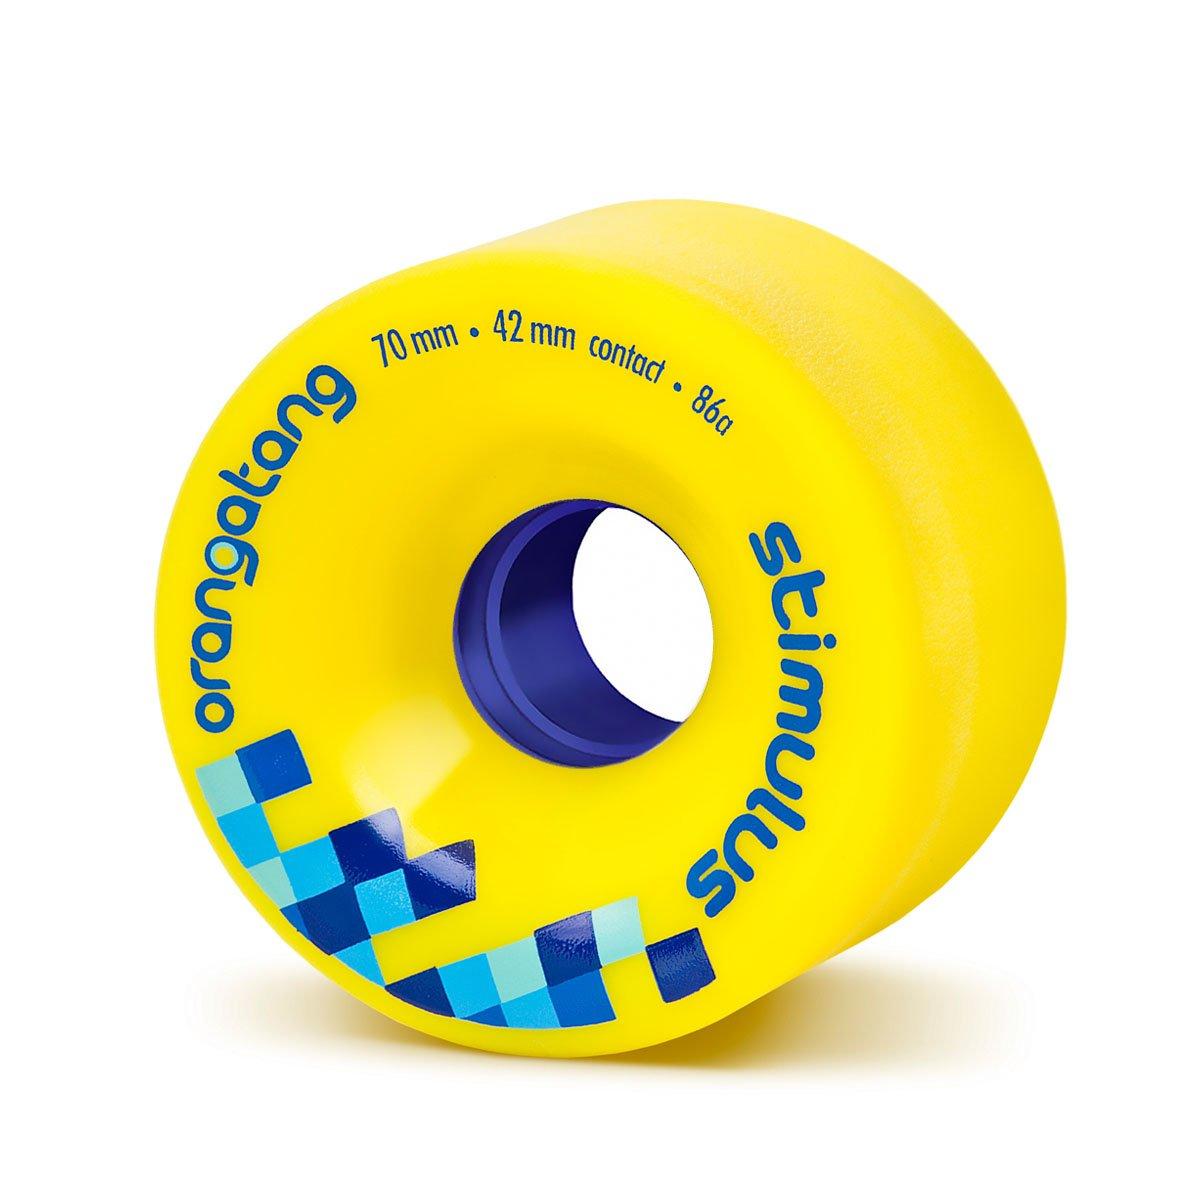 Orangatang Stimulus 70 mm 86a Freeride Longboard Skateboard Wheels (Yellow, Set of 4) by Orangatang